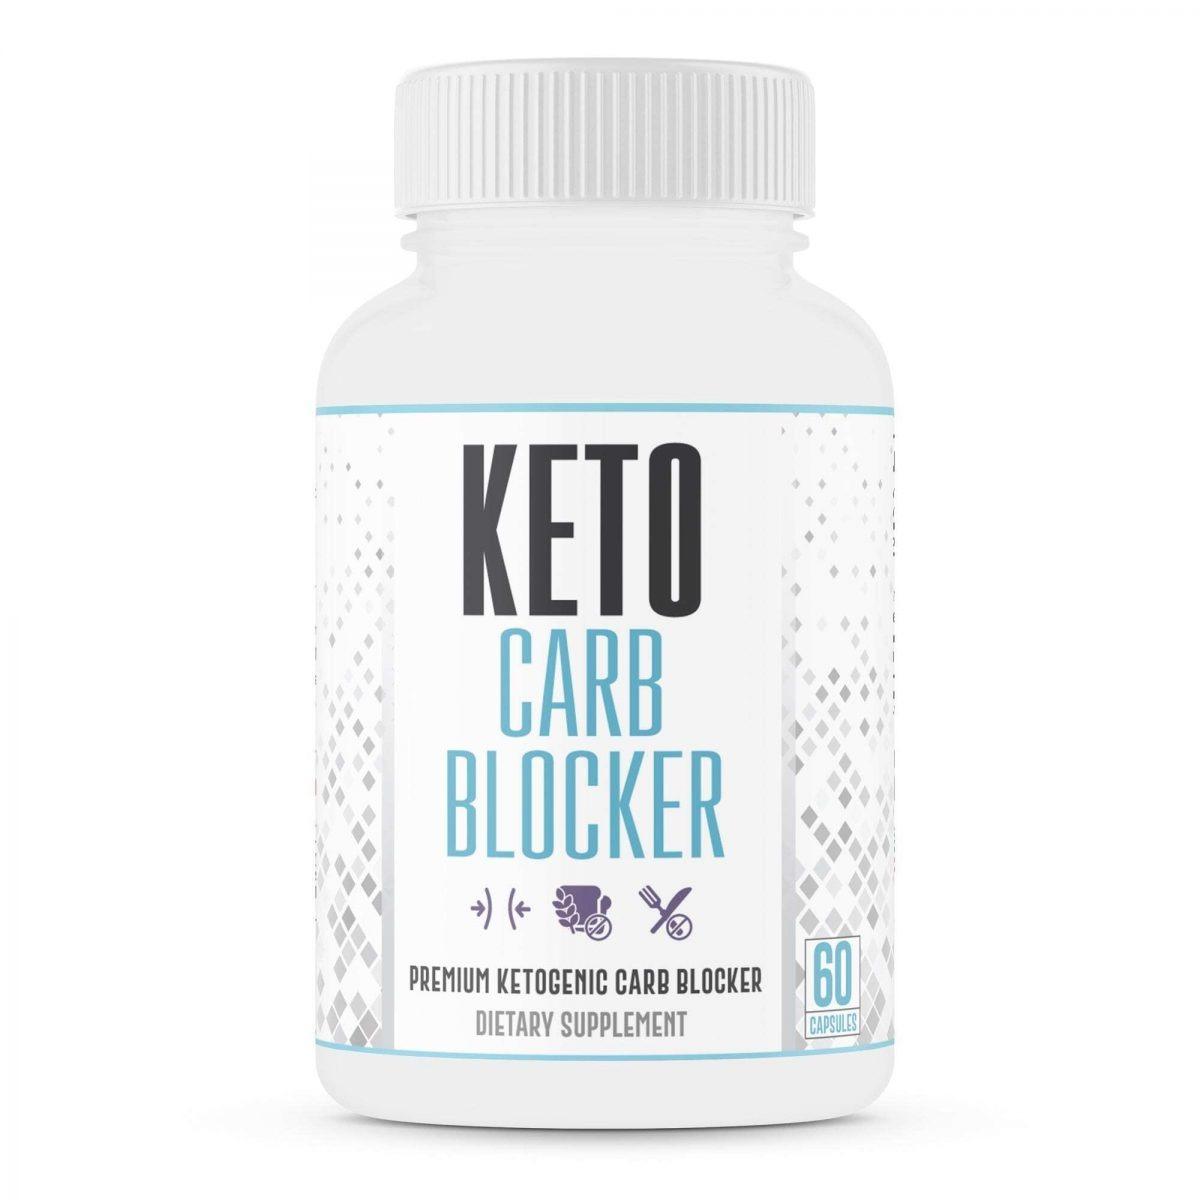 Ultimate Keto Stack - Keto Ultra Weight Loss & Carb Blocking Combo - 30 Day Supply-3608